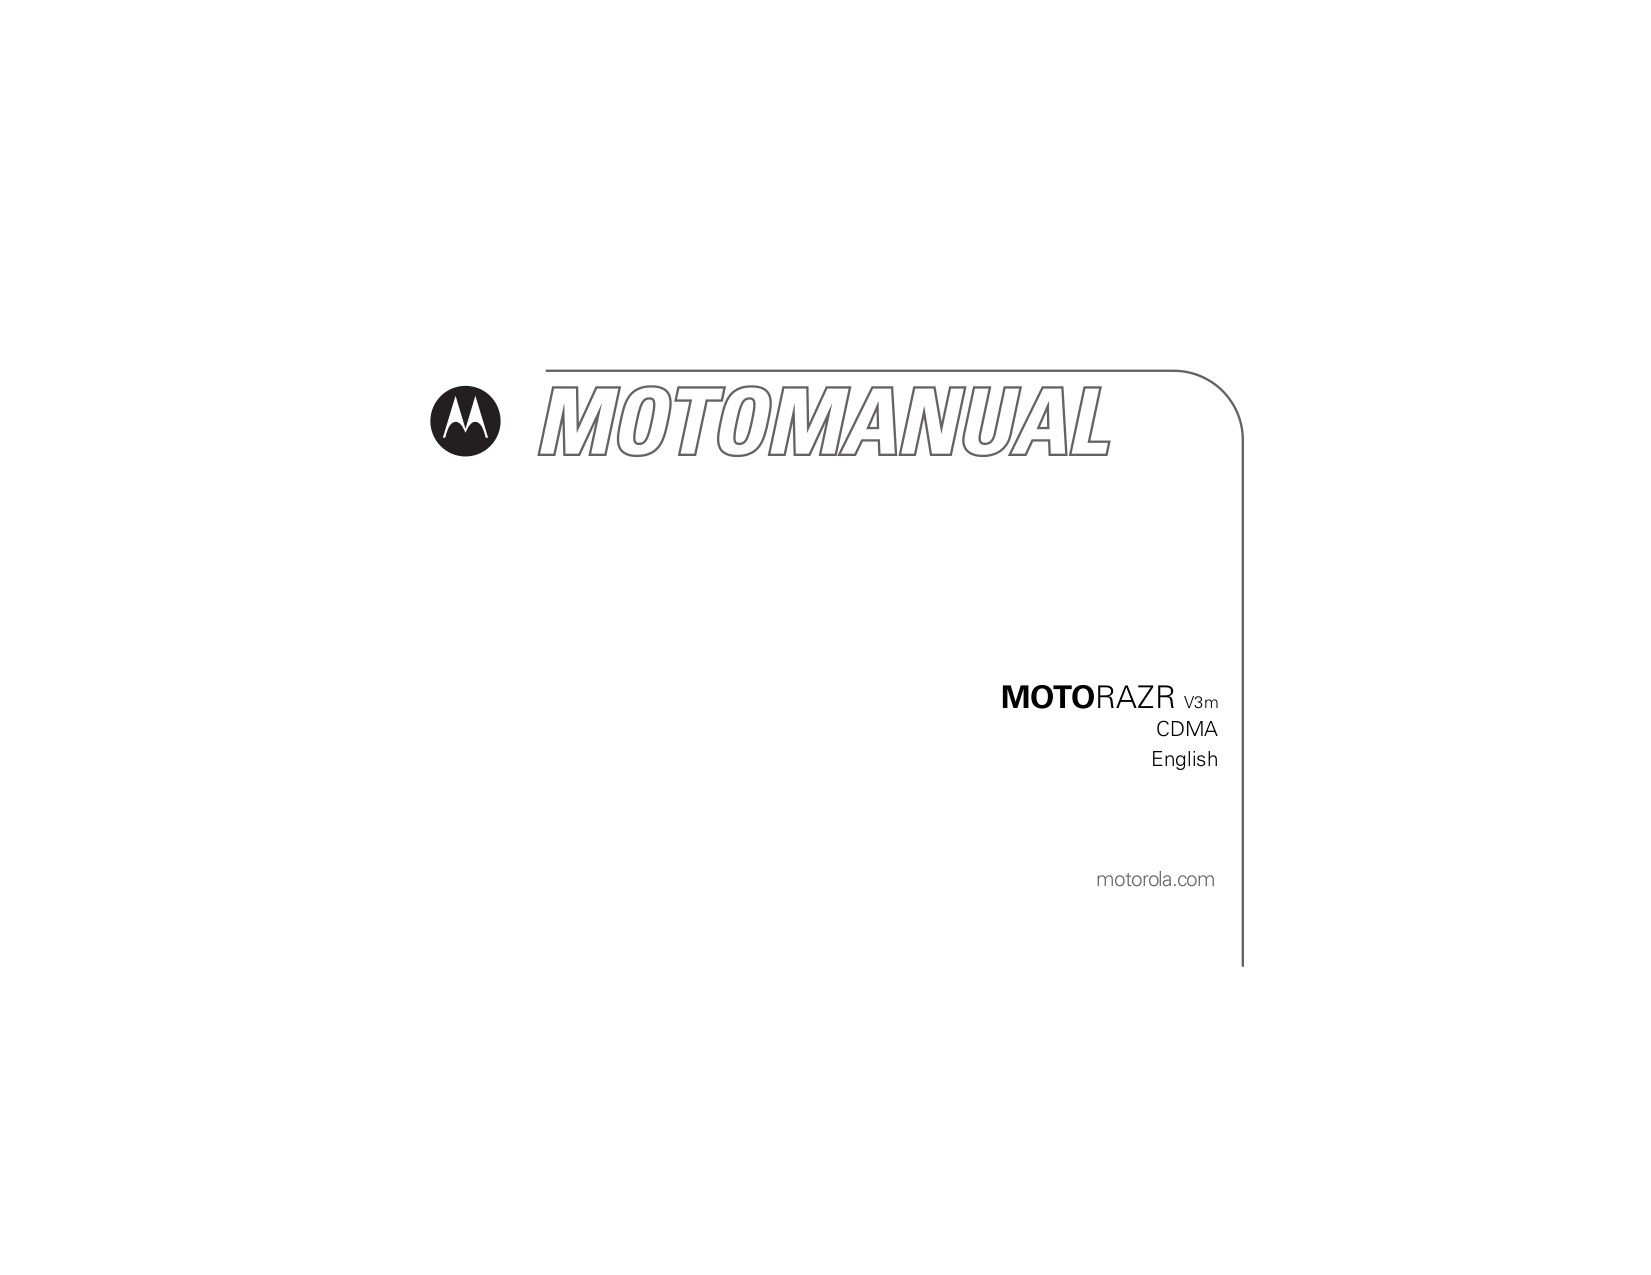 Motorola V3m Manual Diagram Of Honda Generator Parts Ex800 A Jpn Vin G100 Array Download Free Pdf For Razr Cell Phone Rh Umlib Com